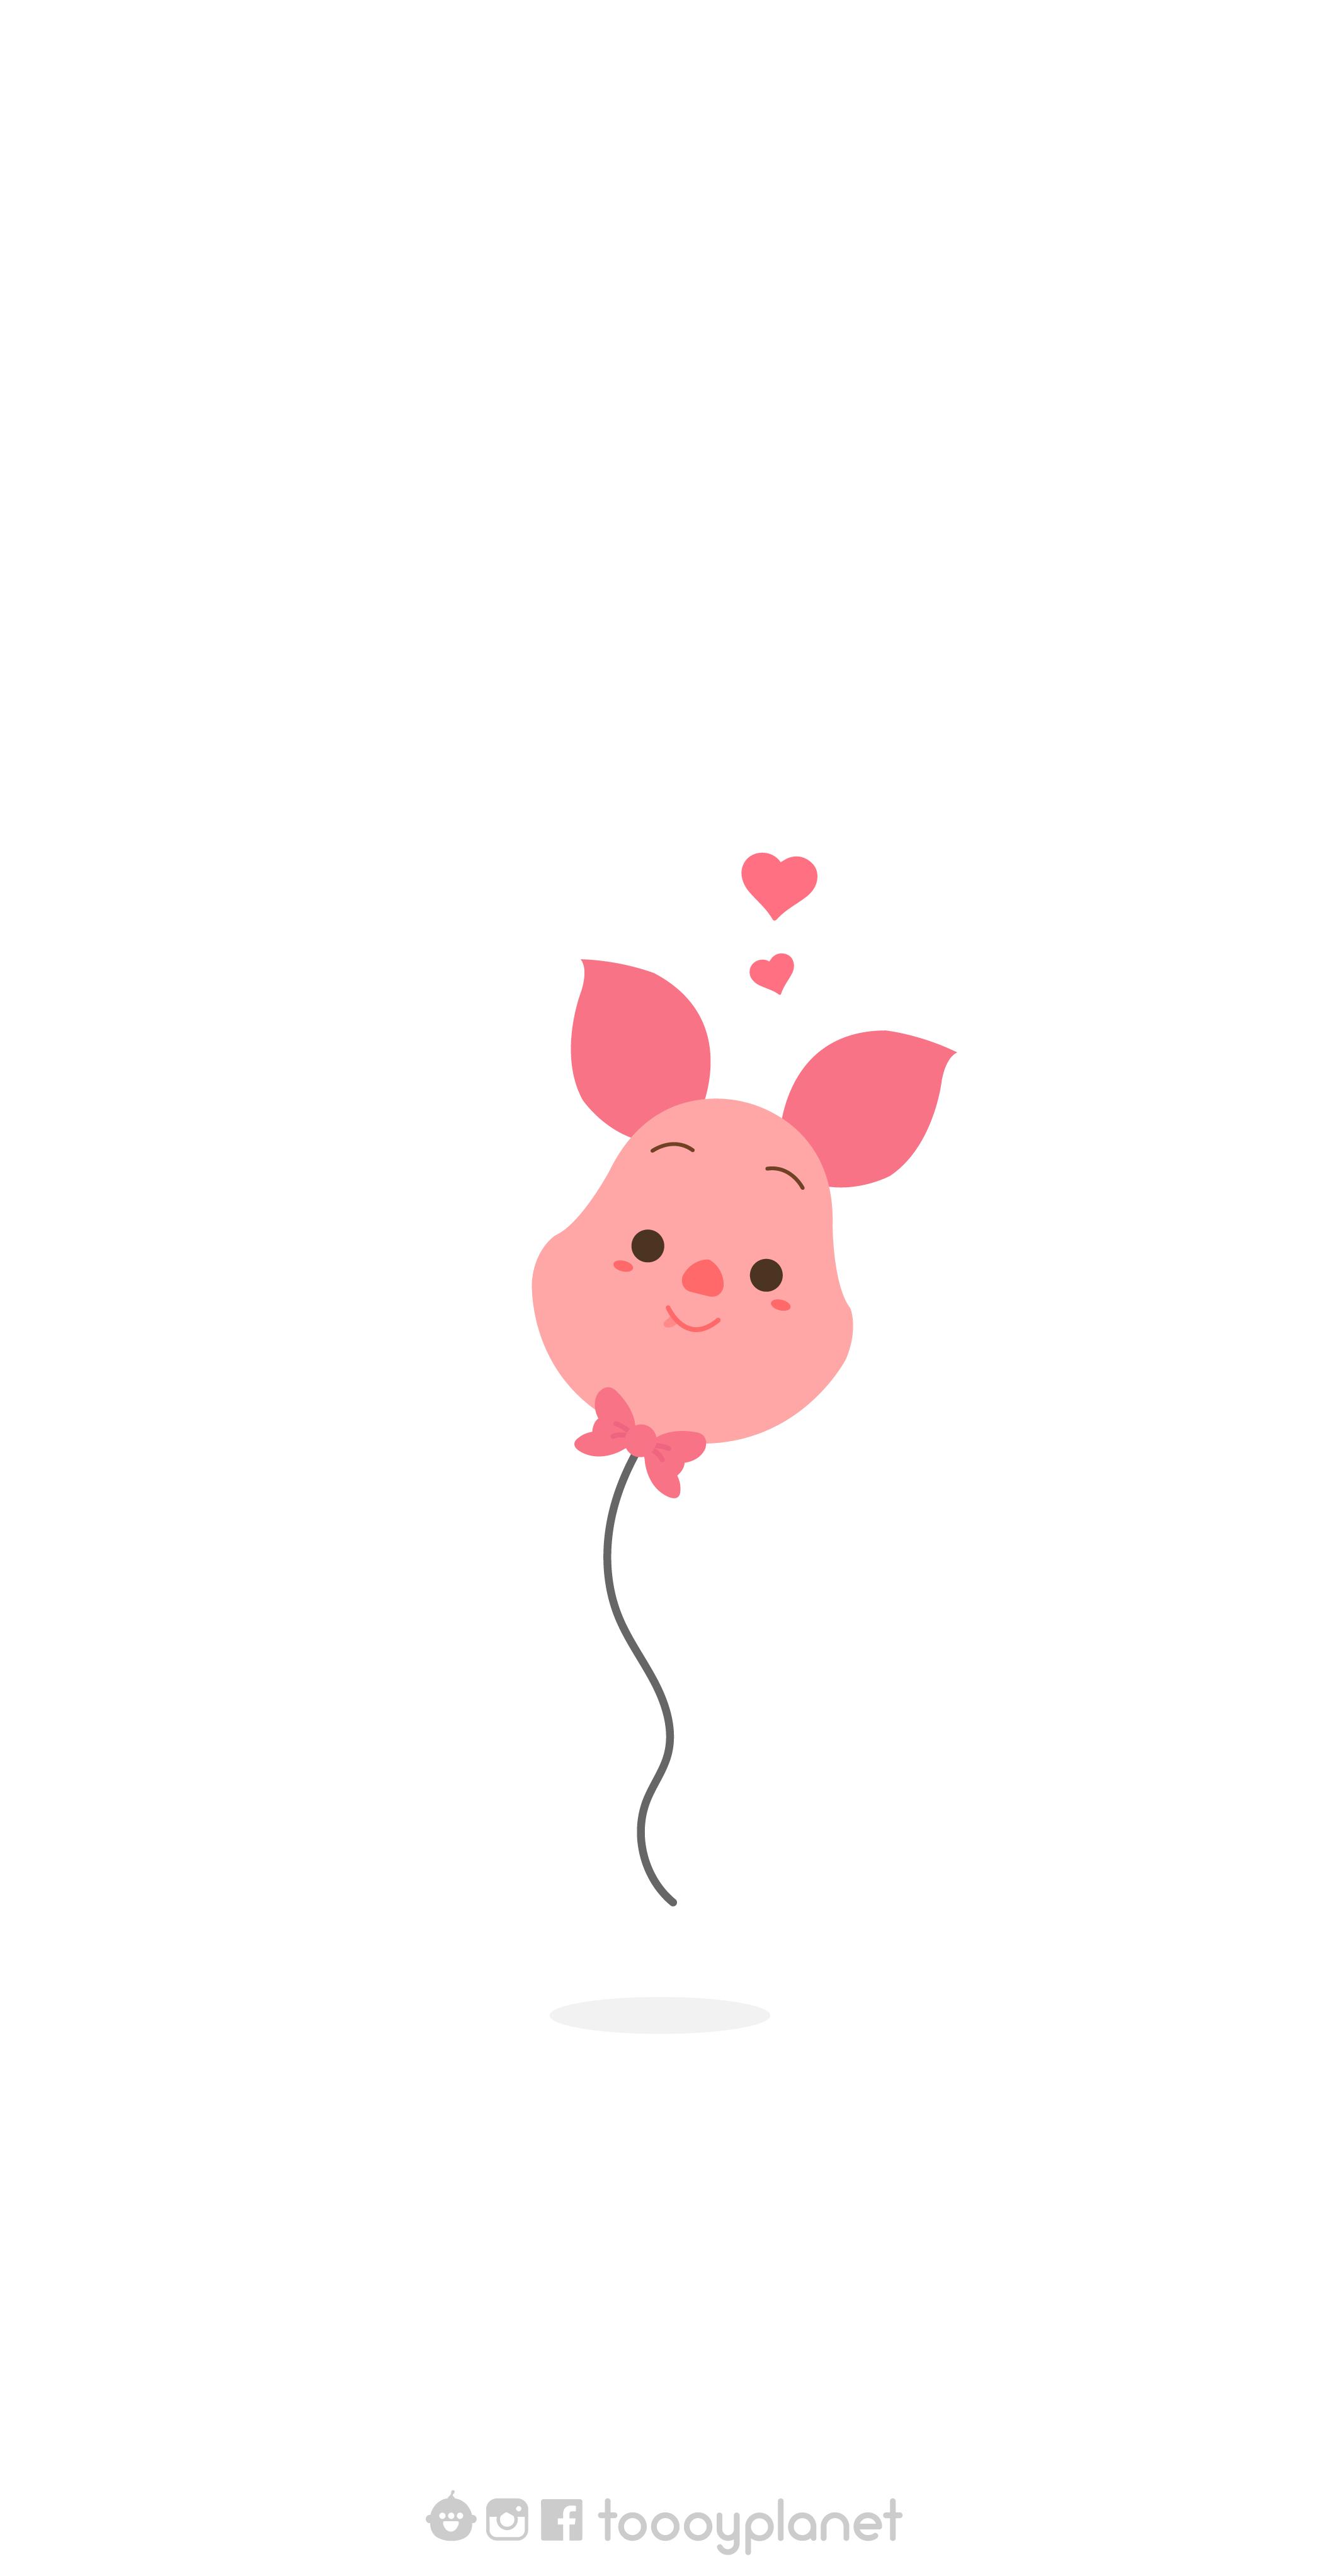 Piglet Disney Wallpaper Cartoon Wallpaper Winnie The Pooh Friends